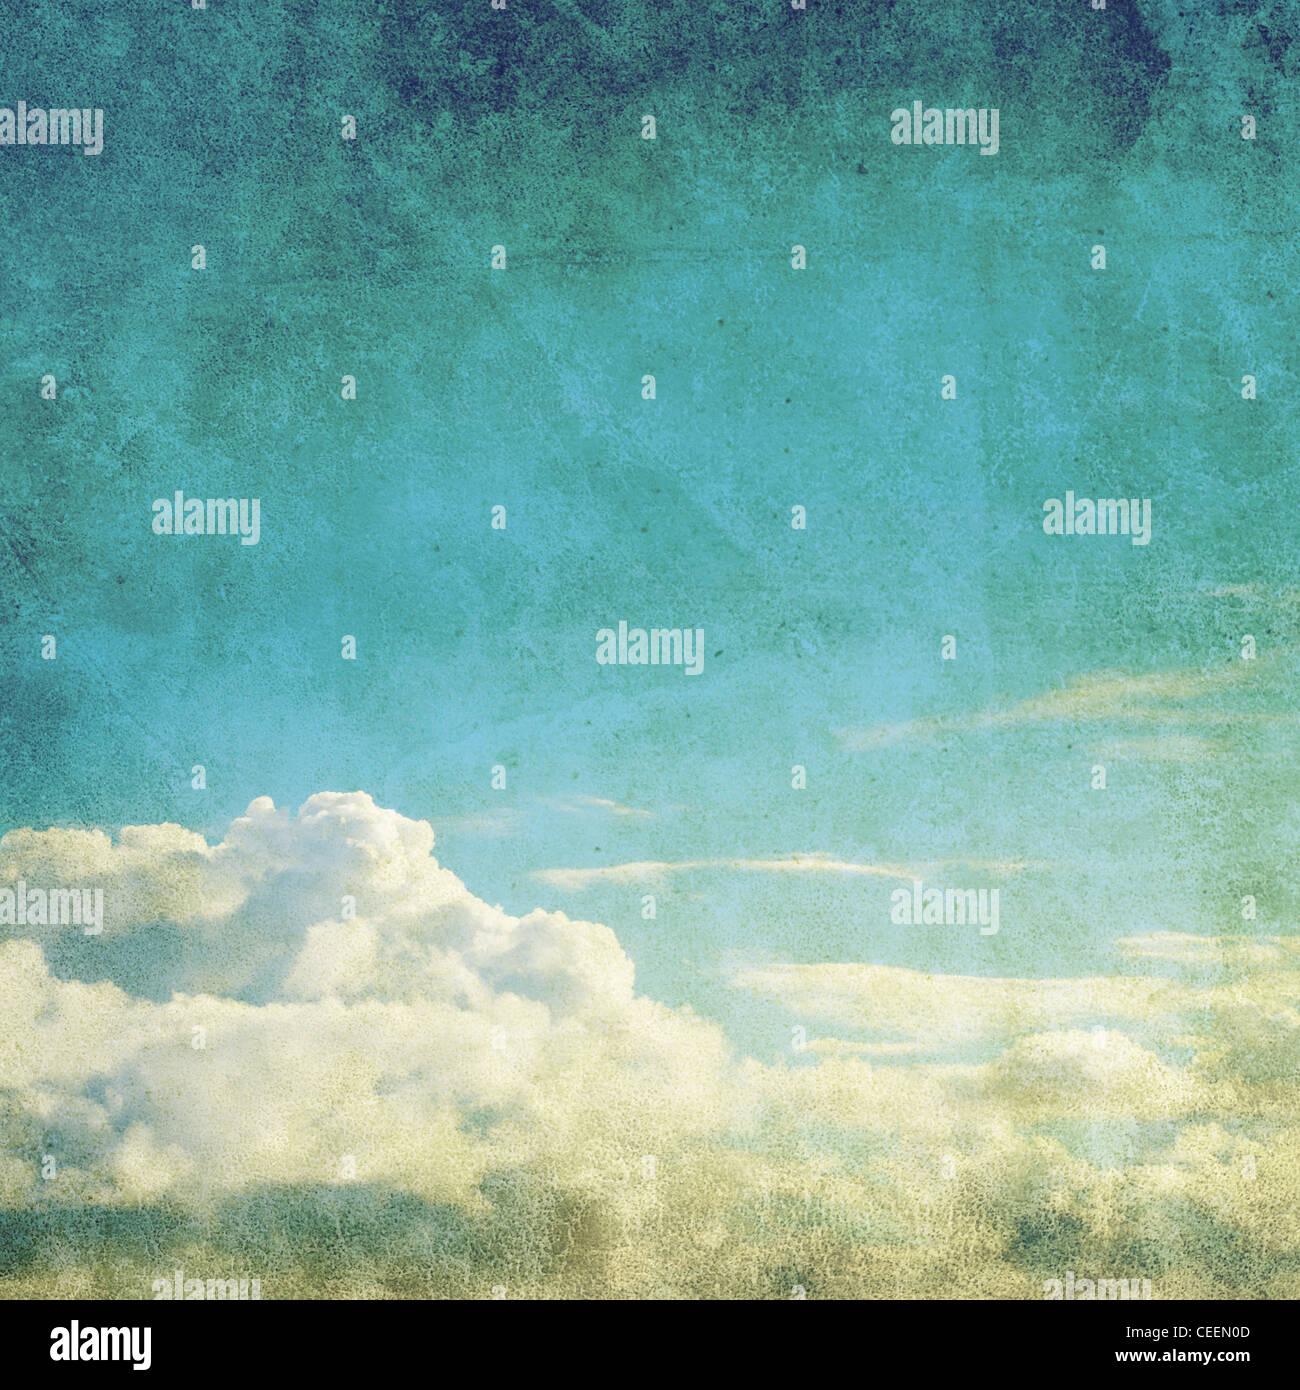 retro sky photo - Stock Image